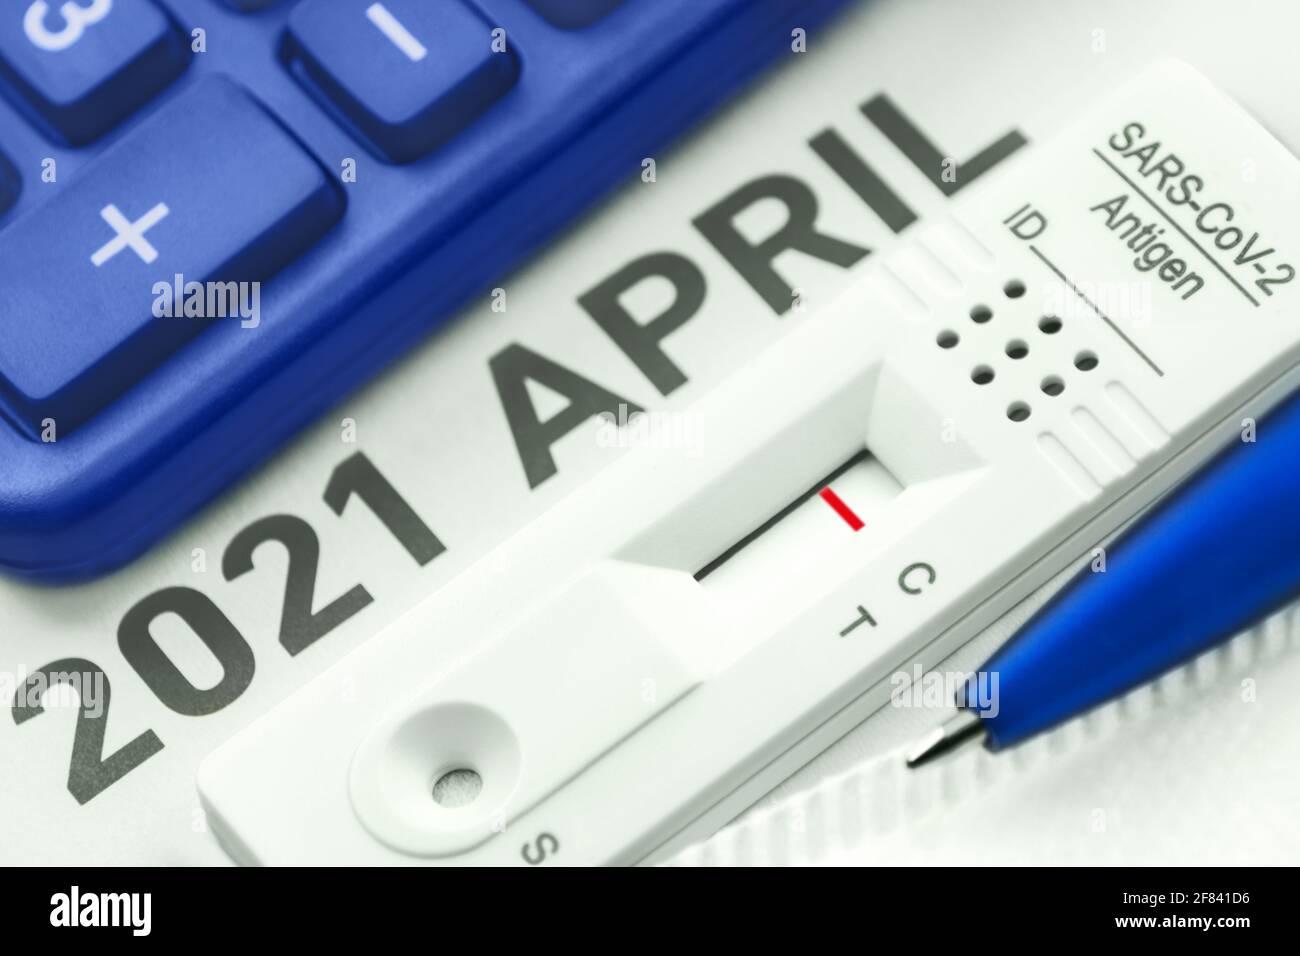 Corona Antigen Rapid Test and calculator Stock Photo